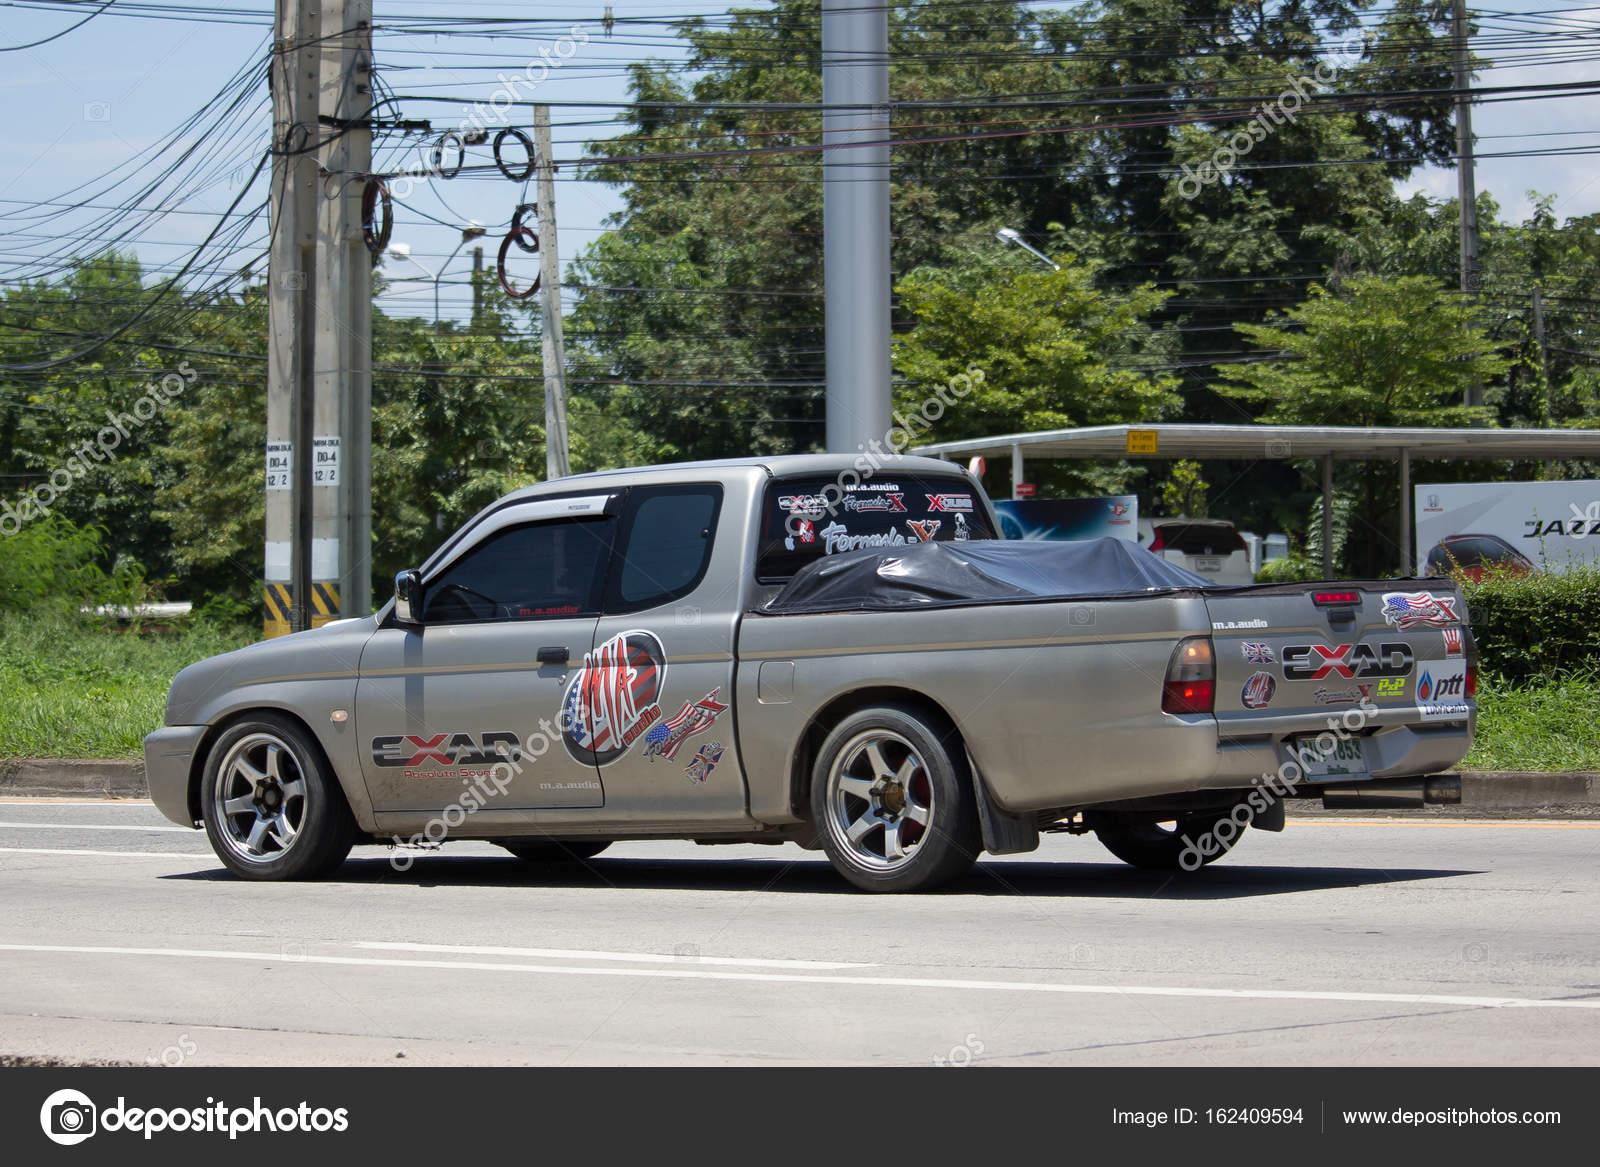 Voiture Prive Vieux Pickup Mitsubishi Strada Photo Editoriale